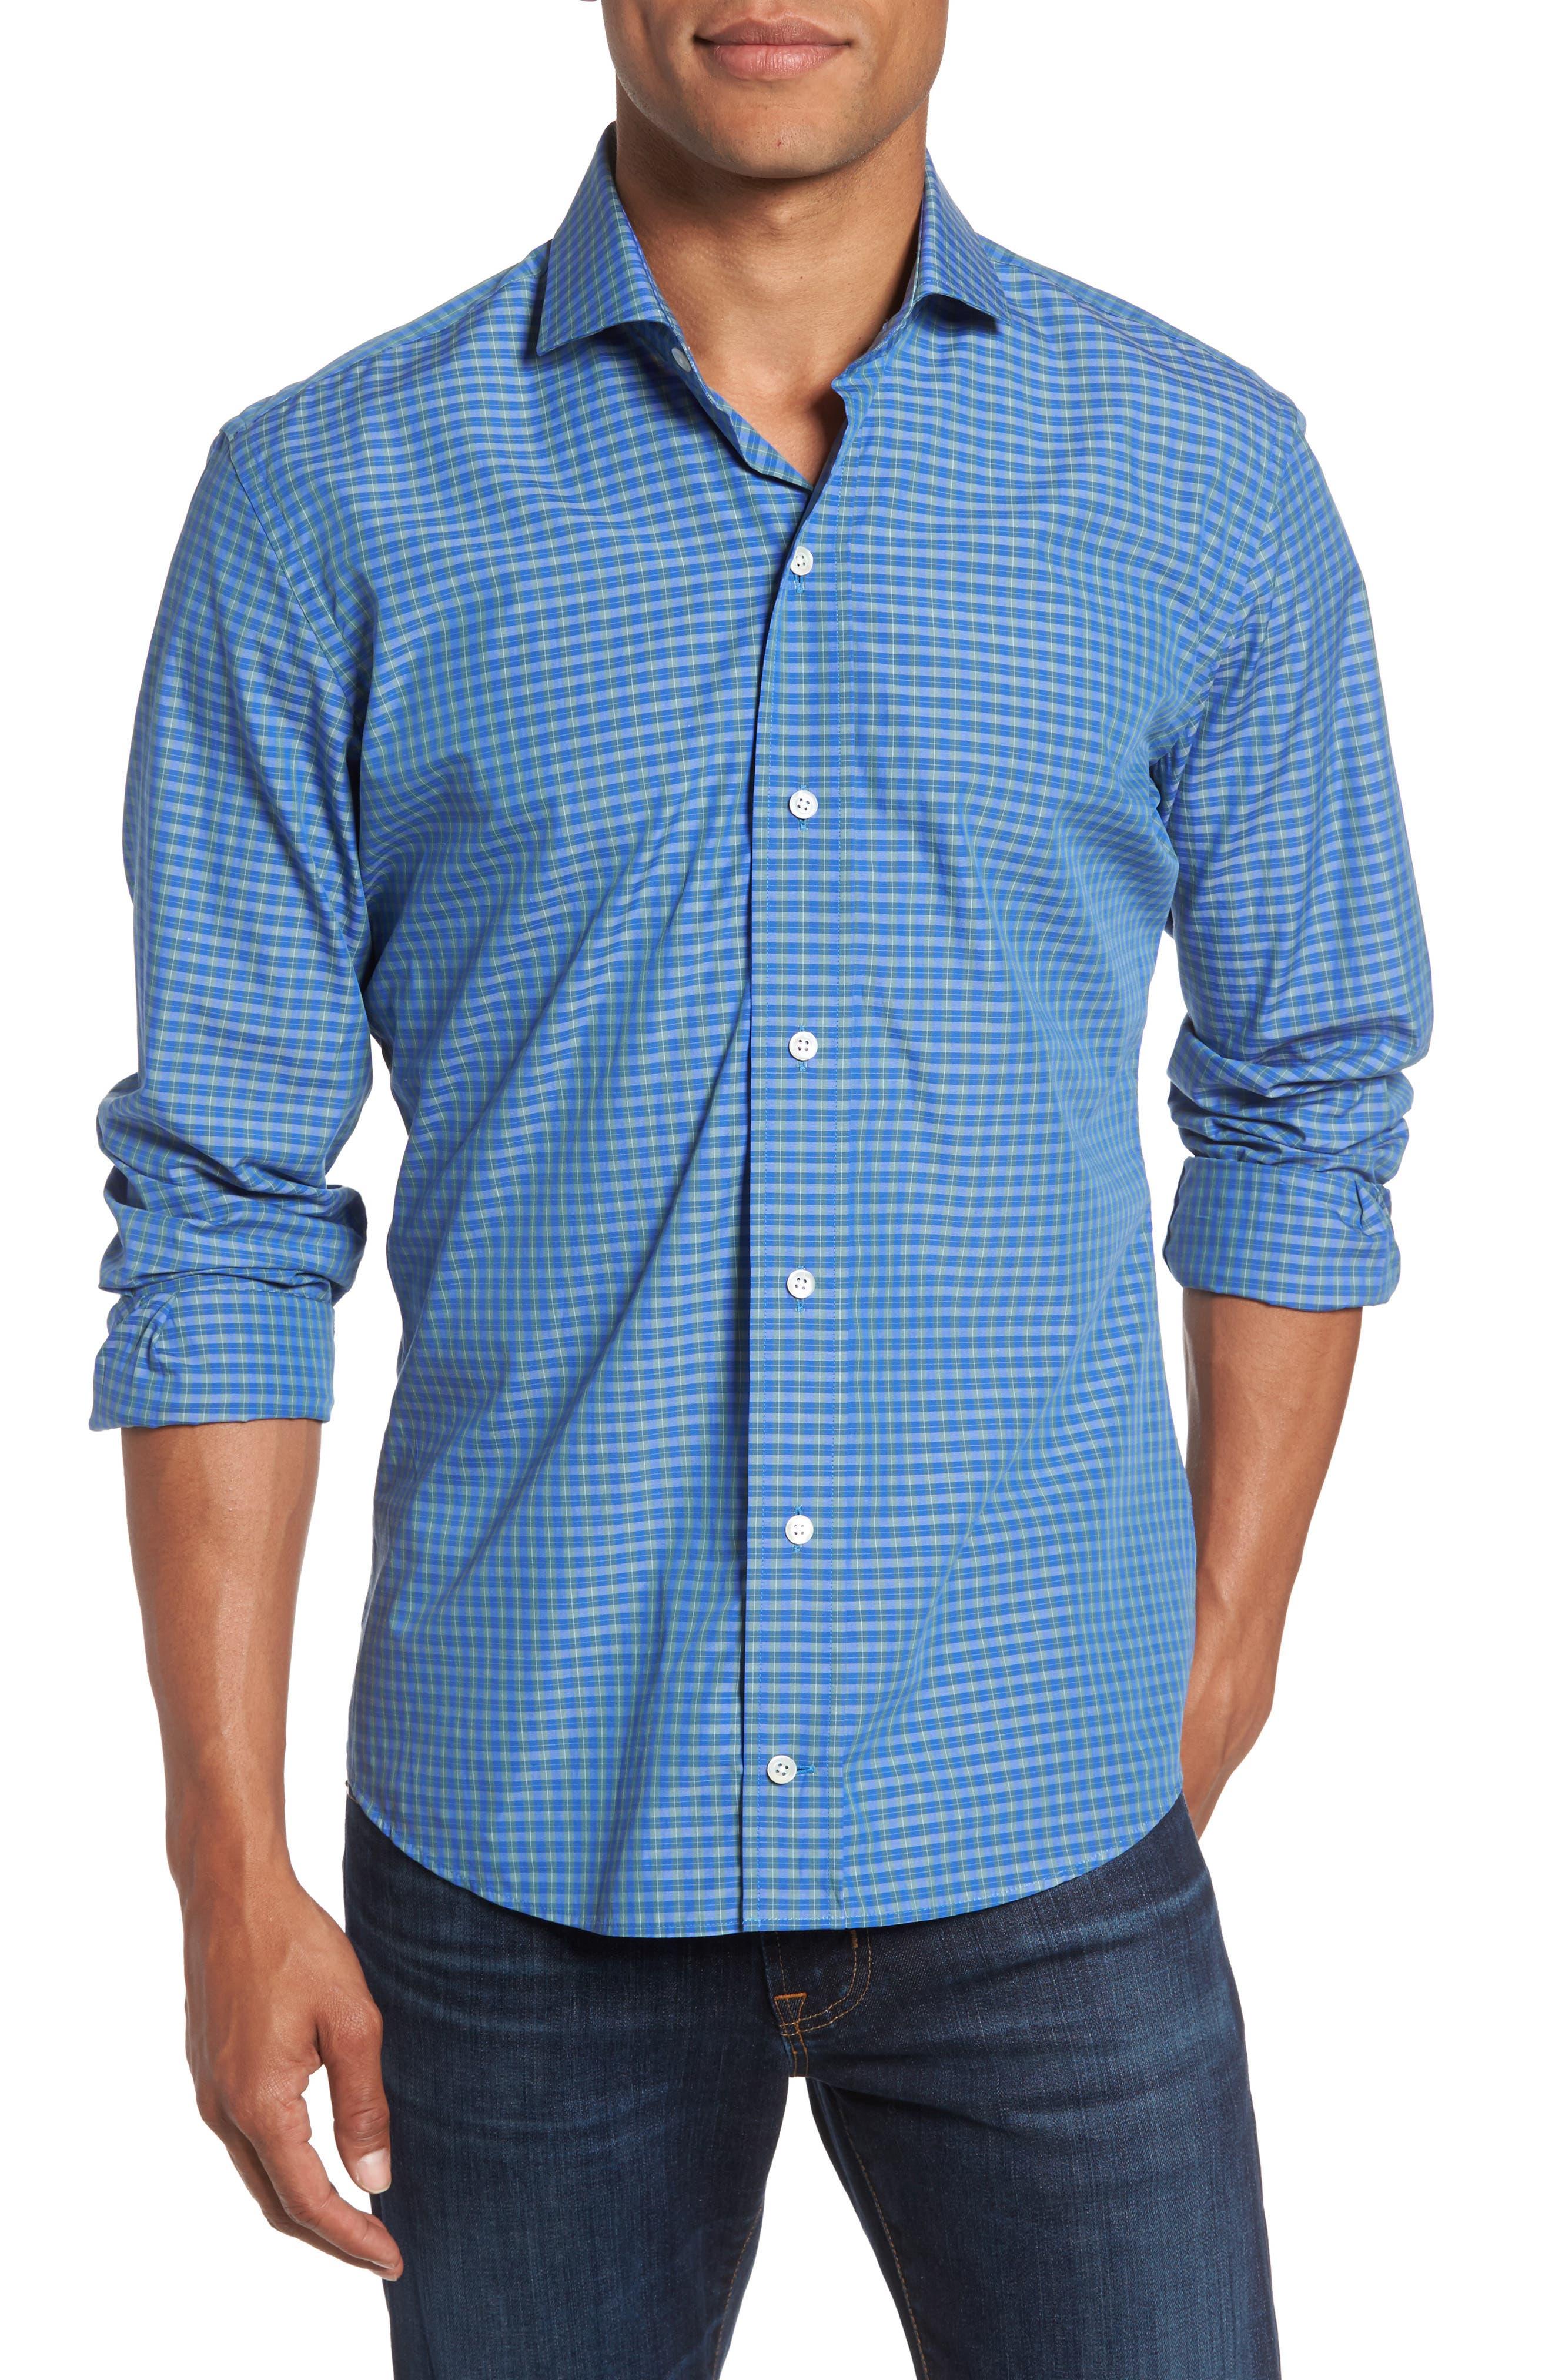 Main Image - Ledbury Alden Slim Fit Plaid Sport Shirt